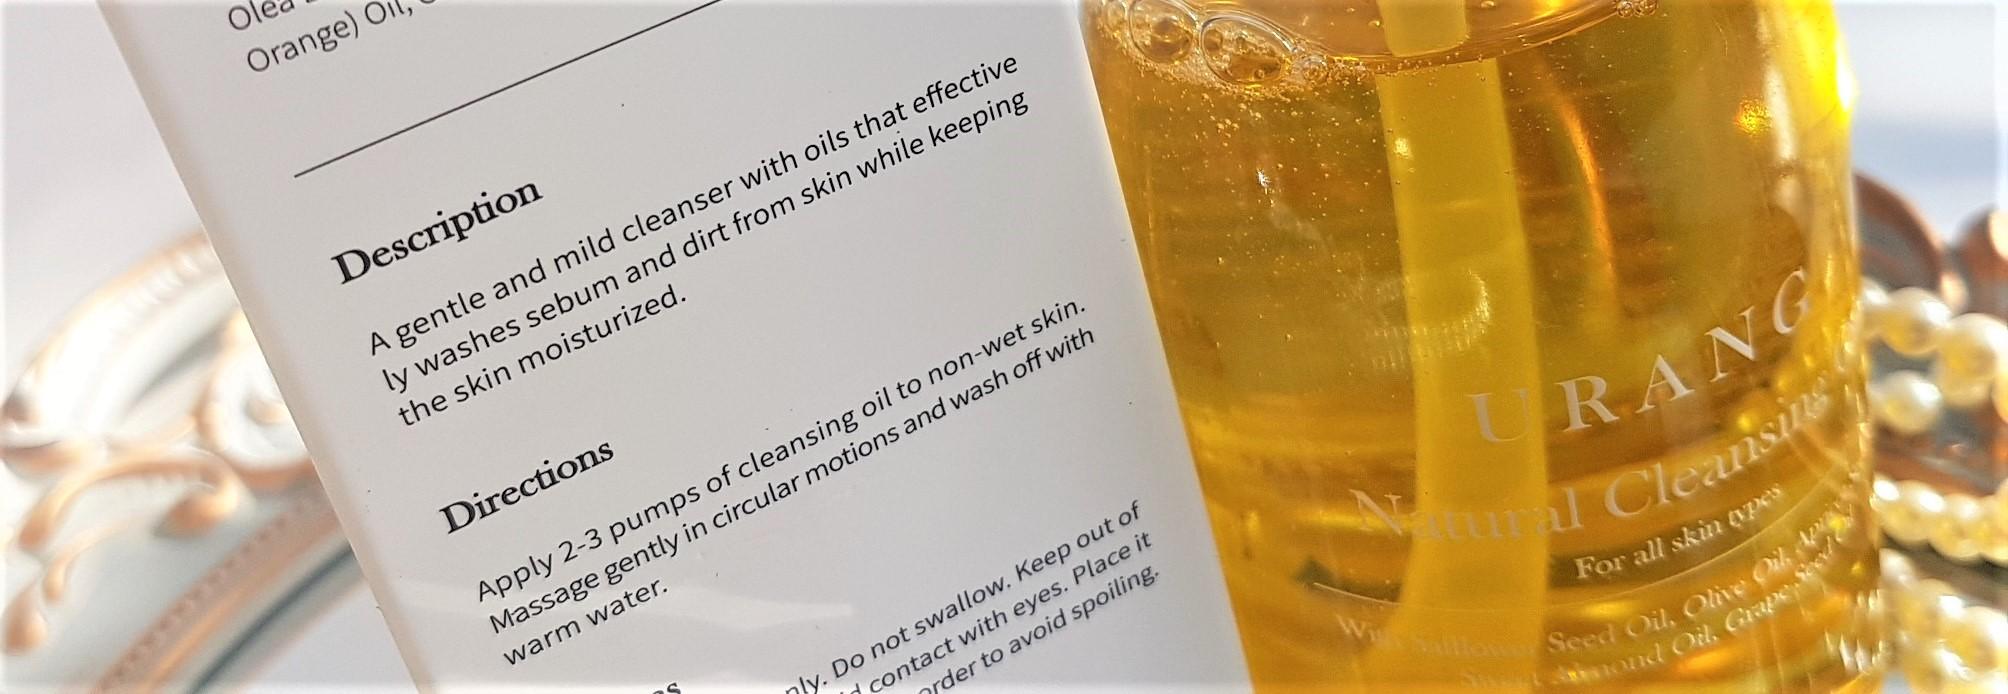 Urang Natural Cleansing Oil Application